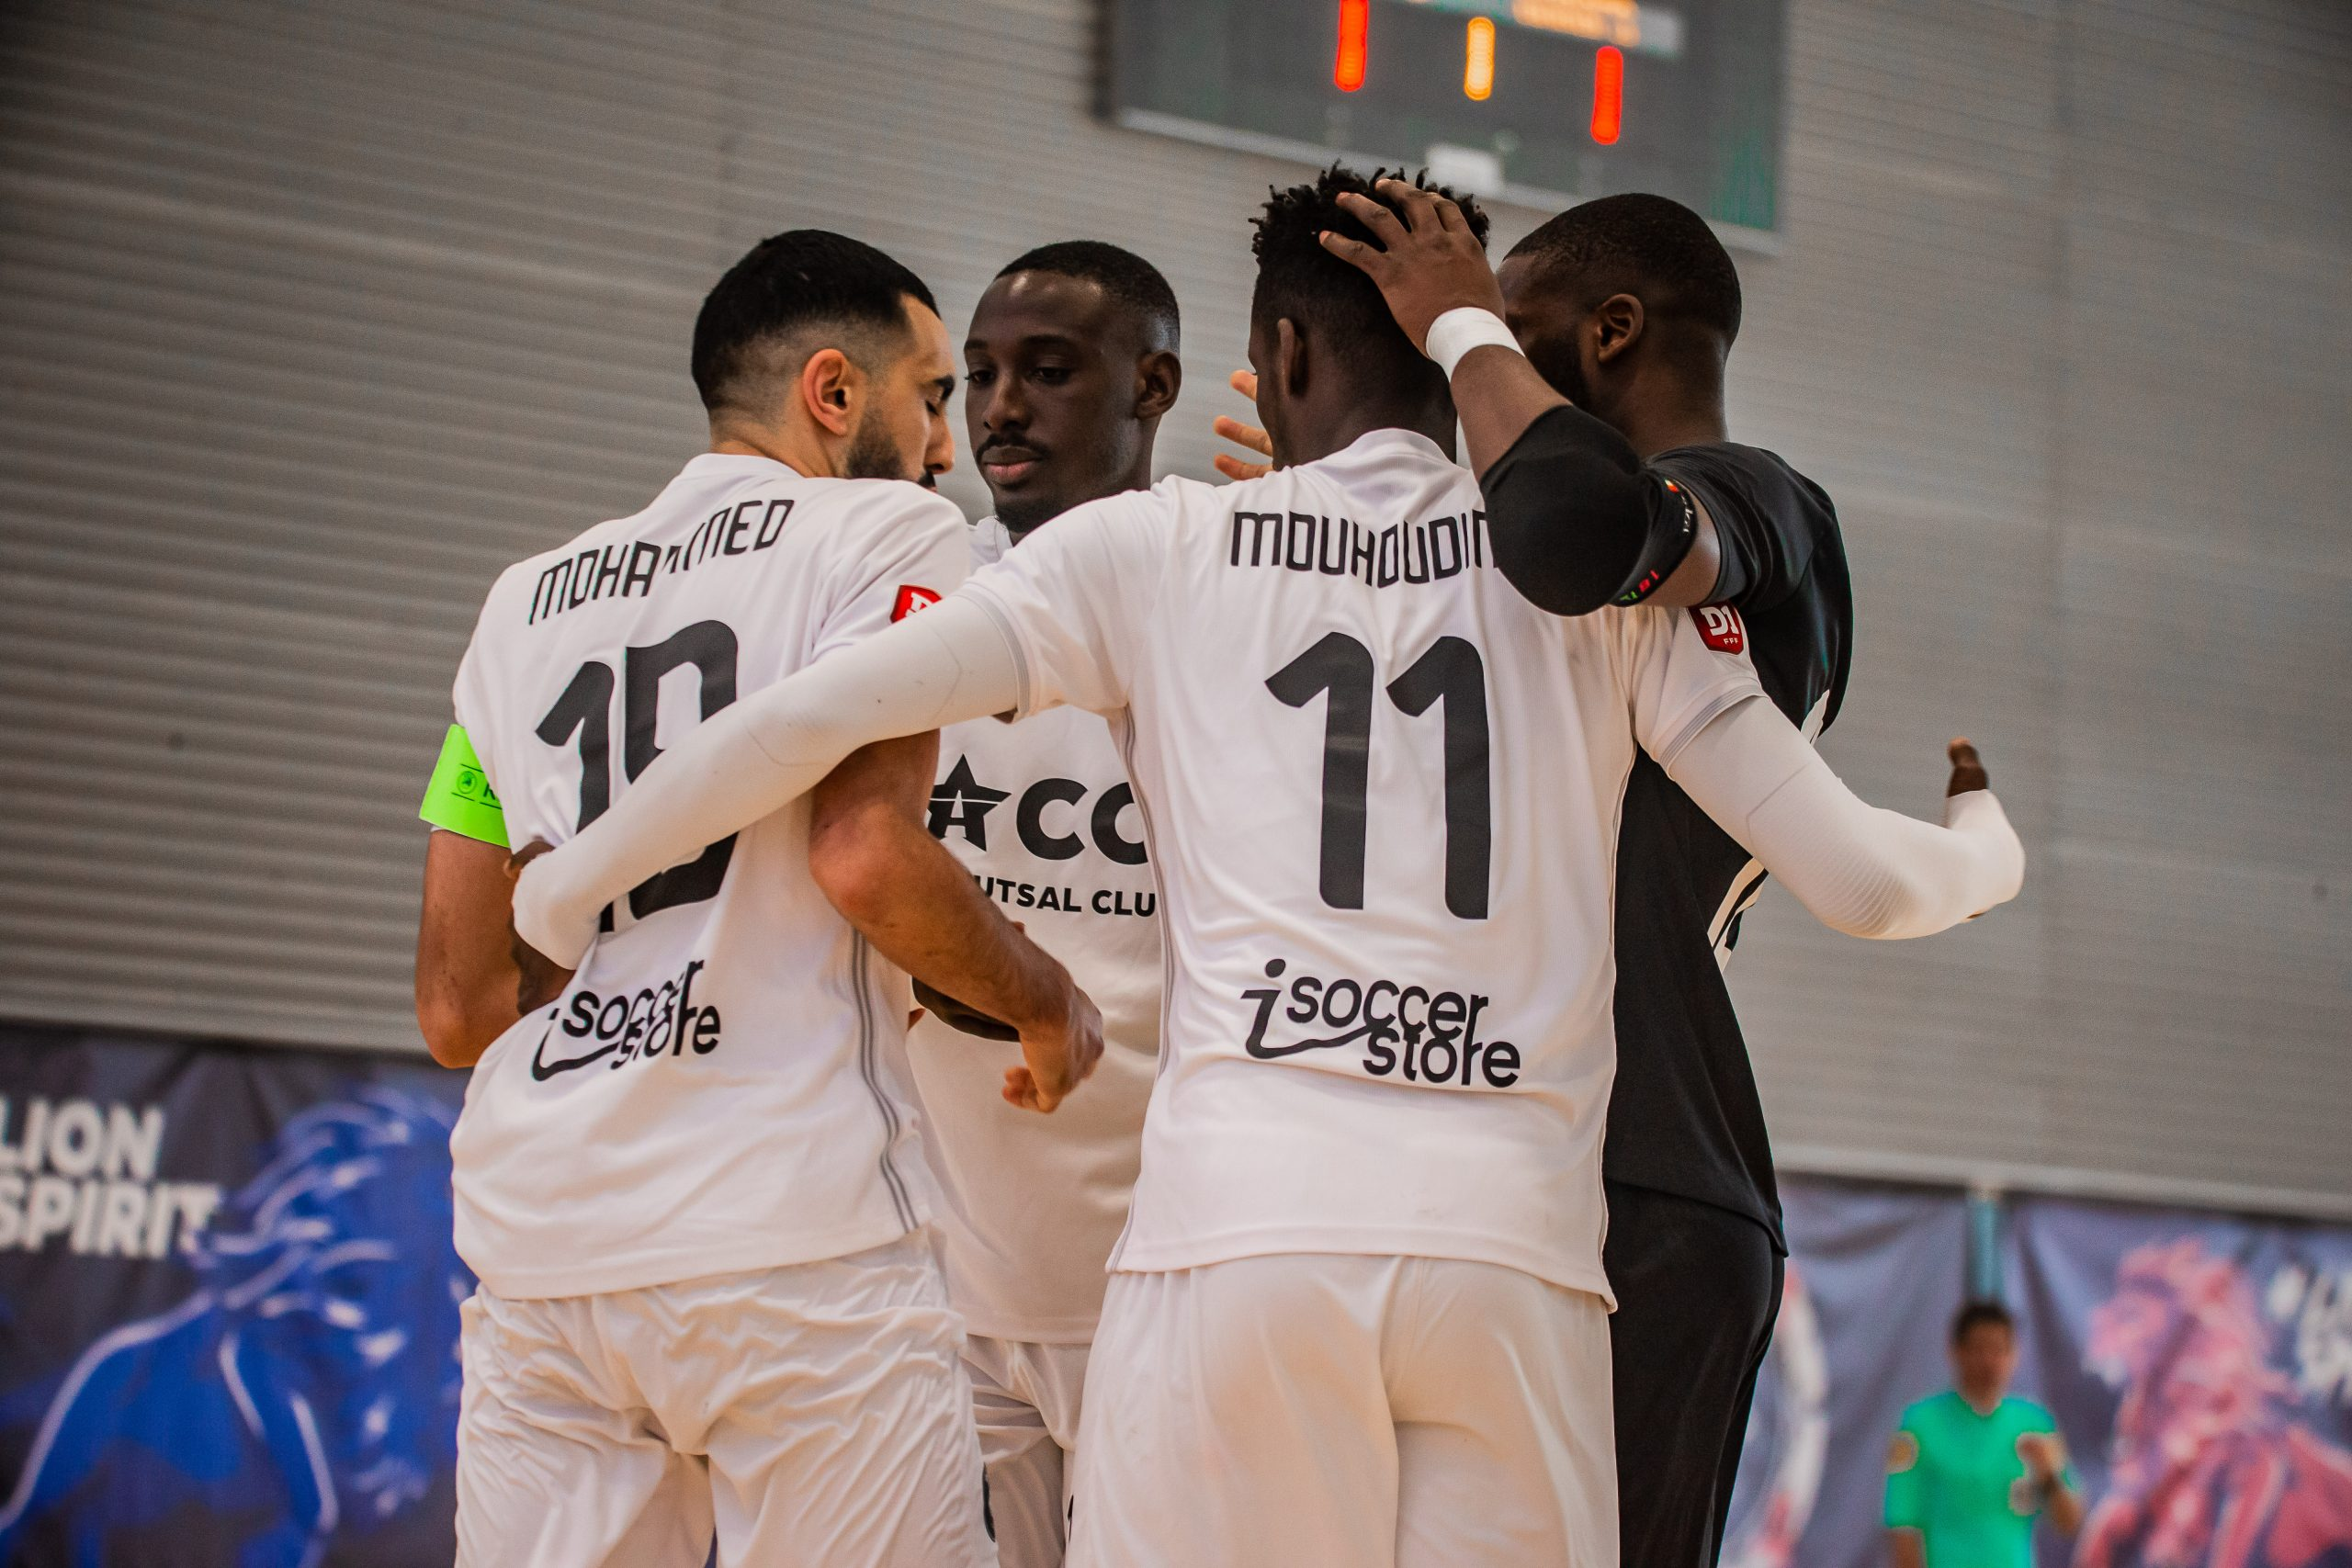 ACCS Futsal Club … the journey so far